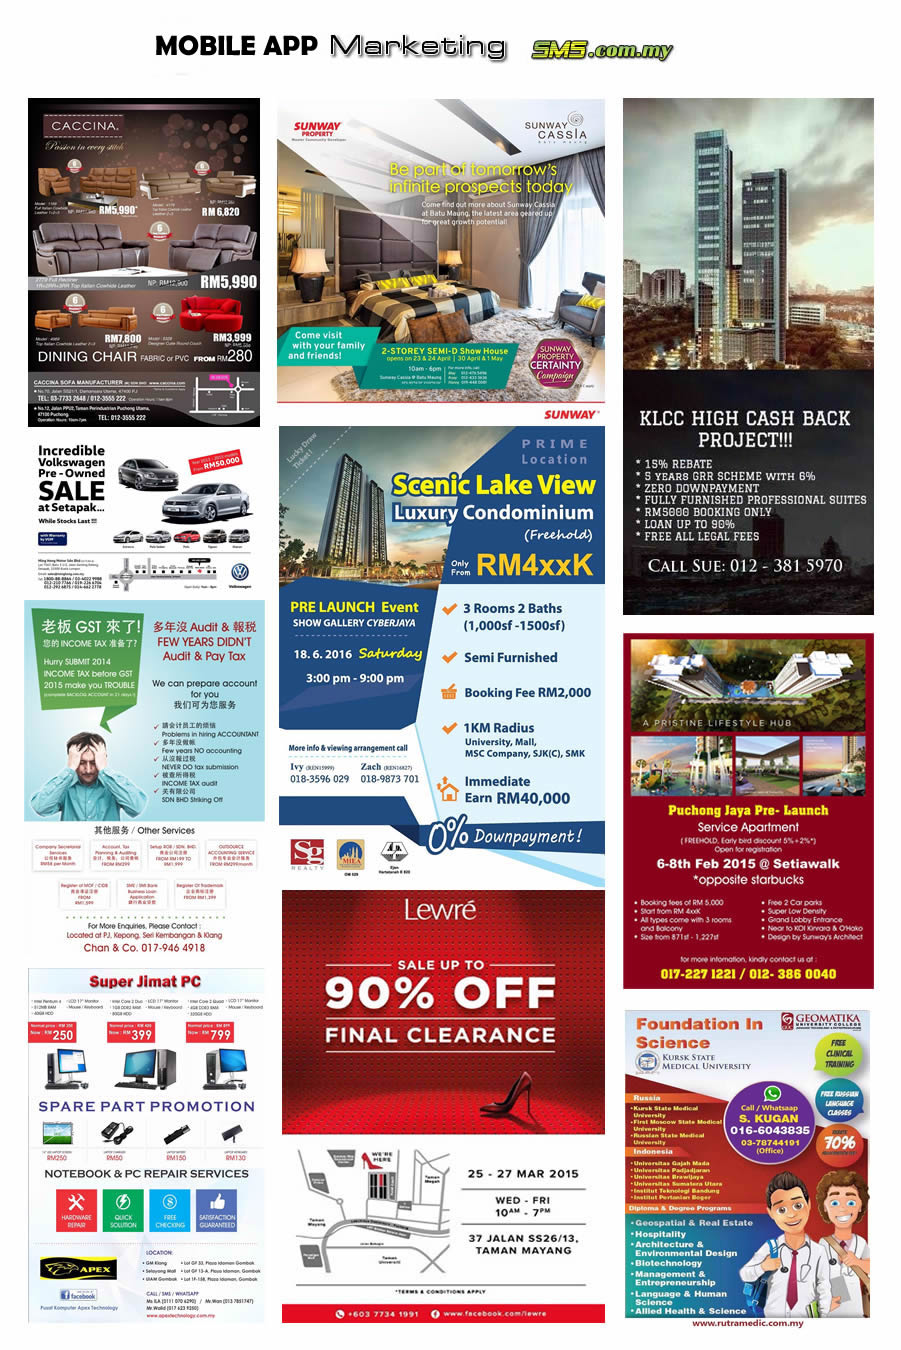 Effective Bulk Mobile App Marketing with Malaysia